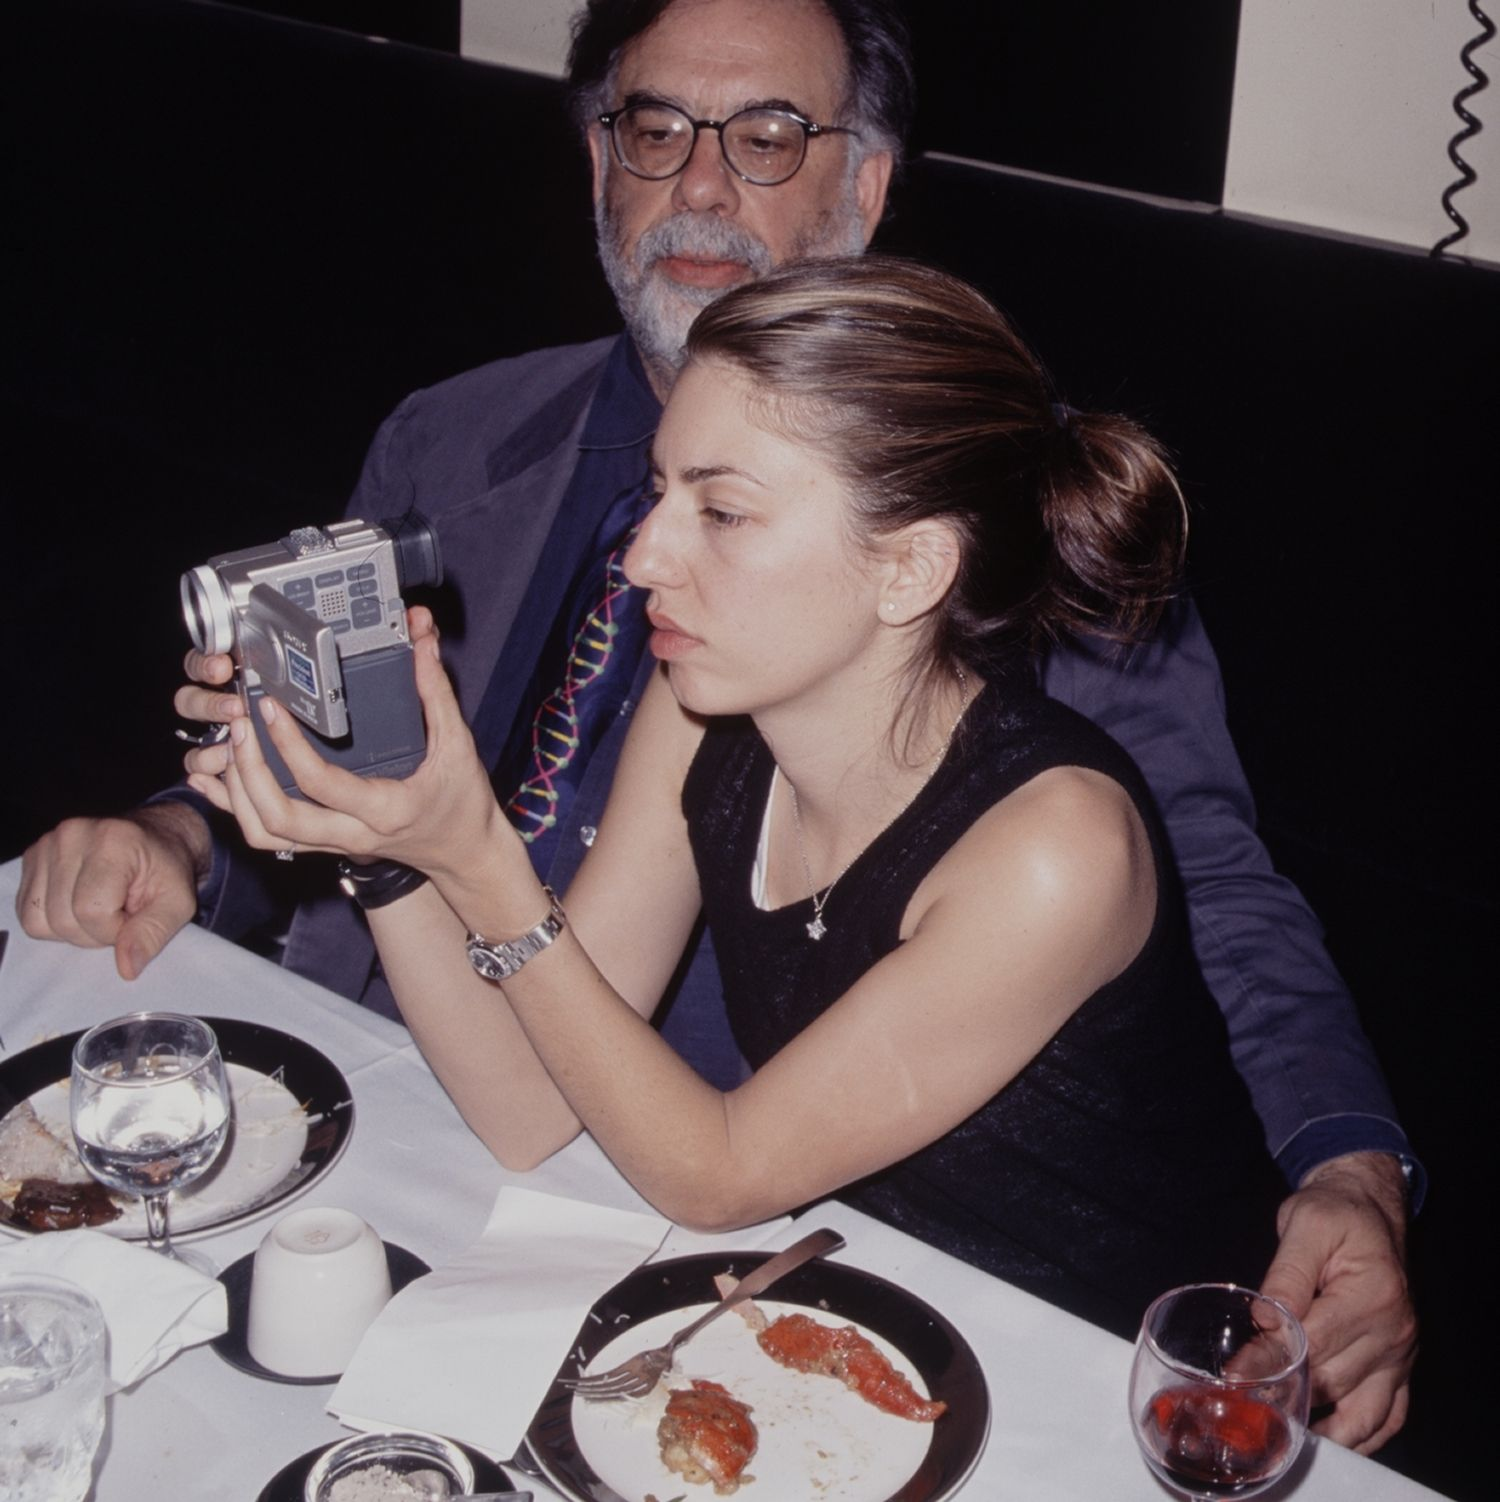 Young Photos of Sofia Coppola